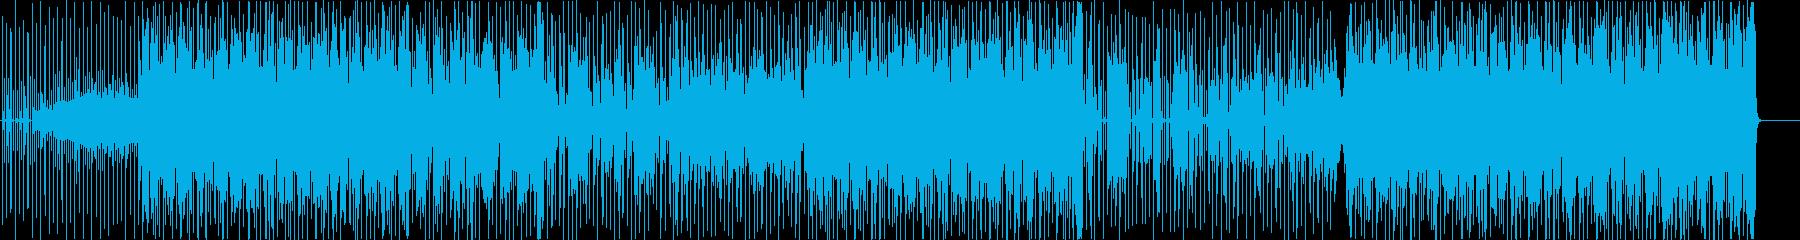 Moebiusの再生済みの波形